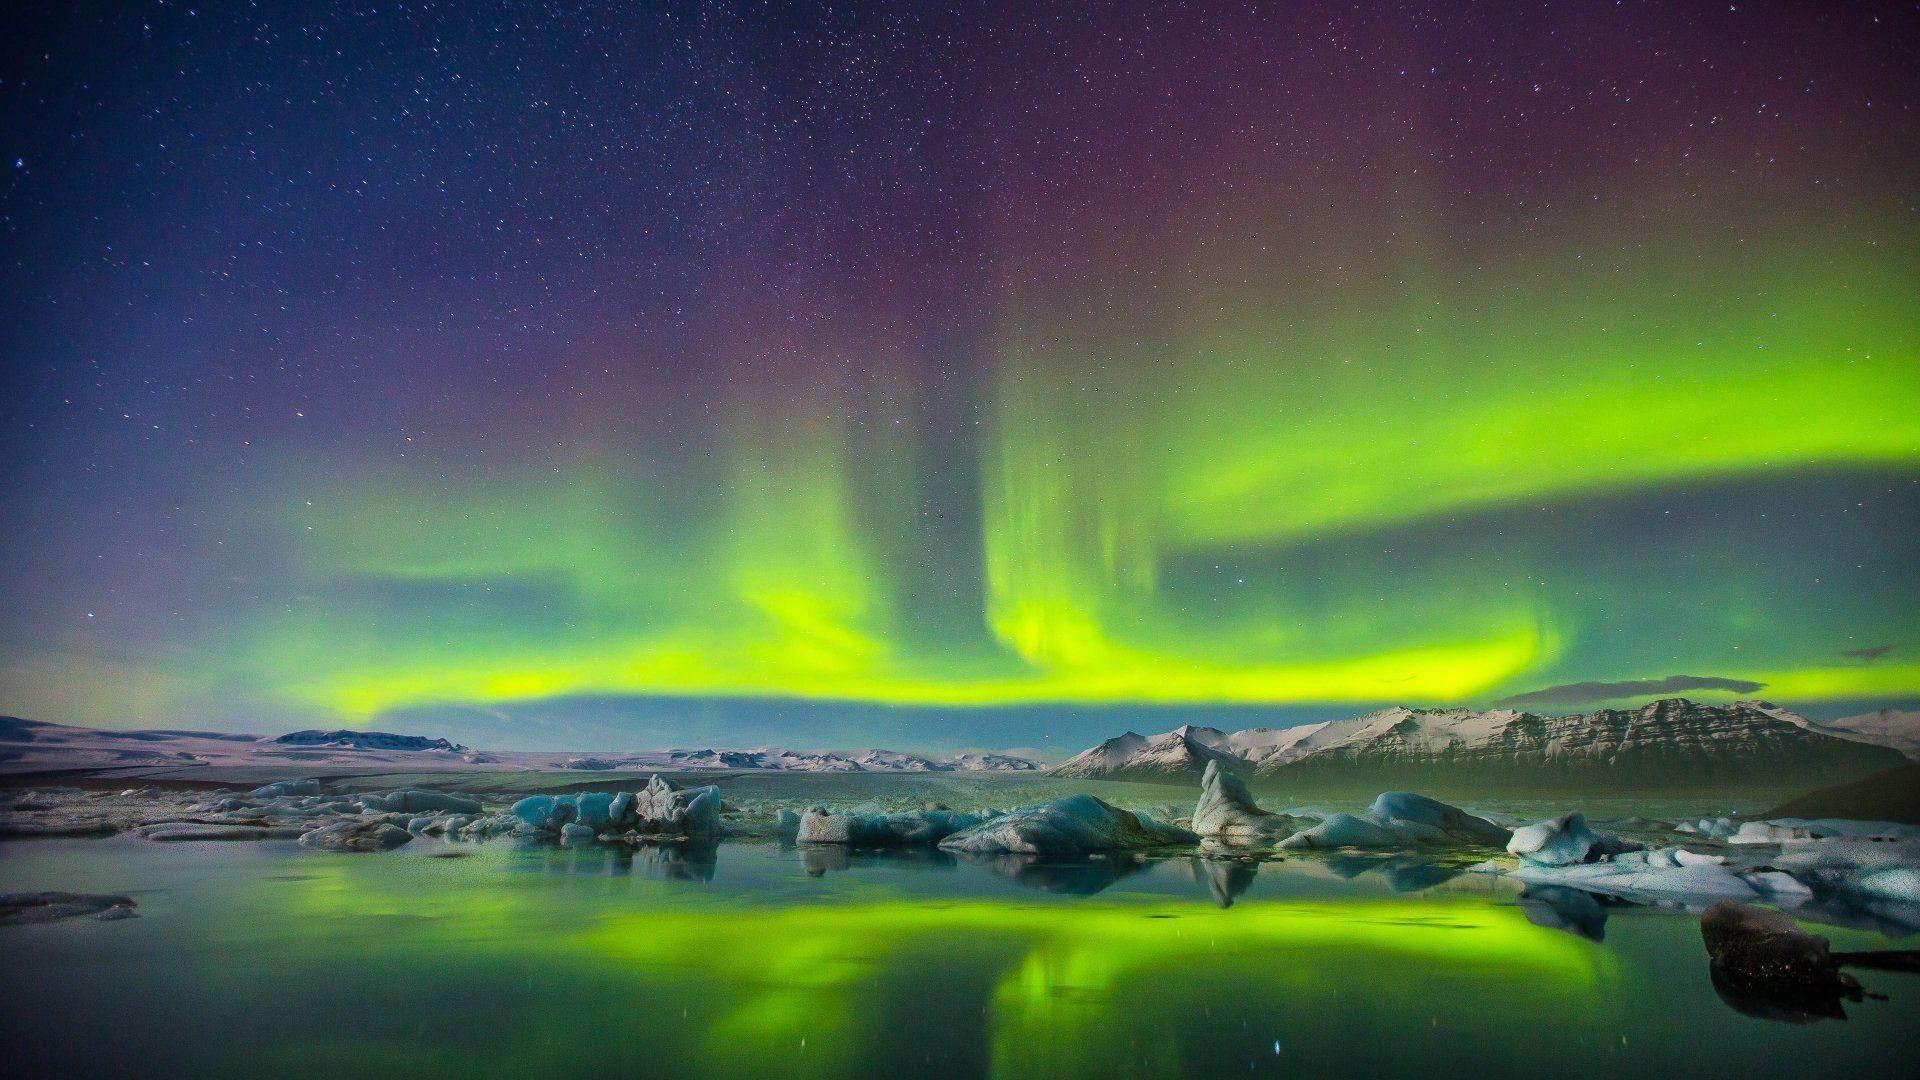 Earthquake forecast previsional model 21 22 aprile 2017 for Sfondi desktop aurora boreale